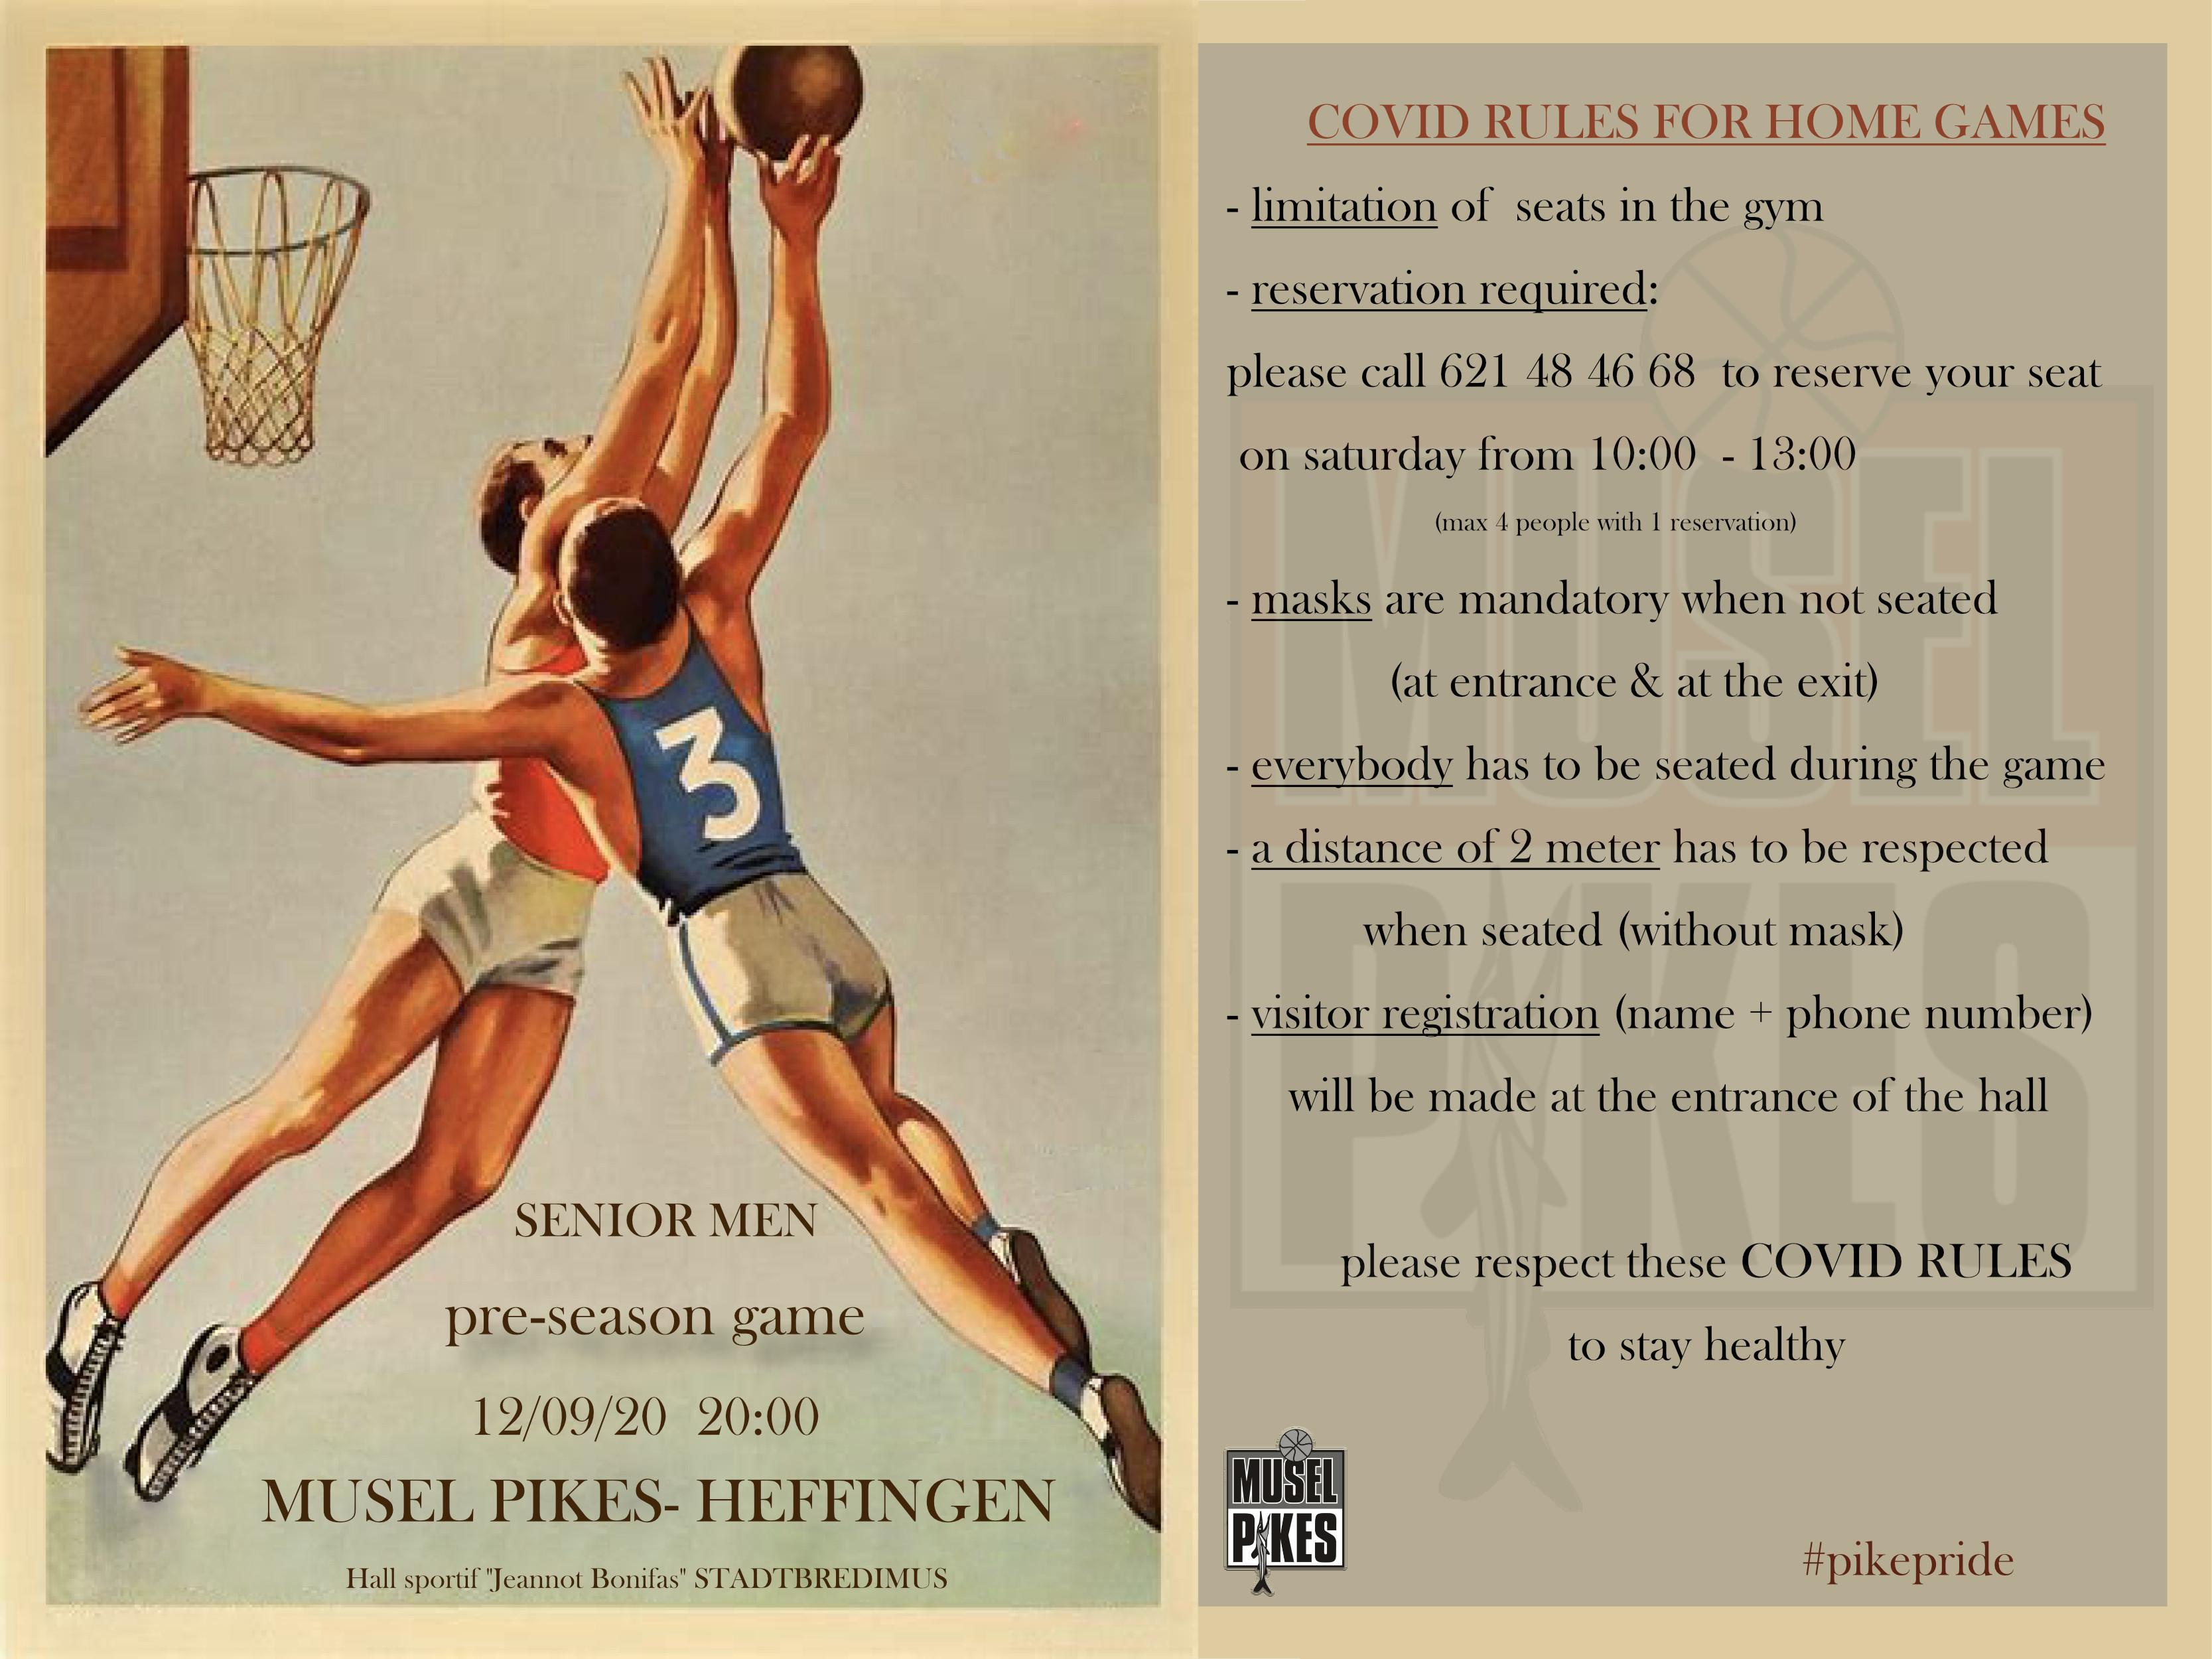 12/09/20 at 20:00 Practice Game Musel Pikes-Heffingen